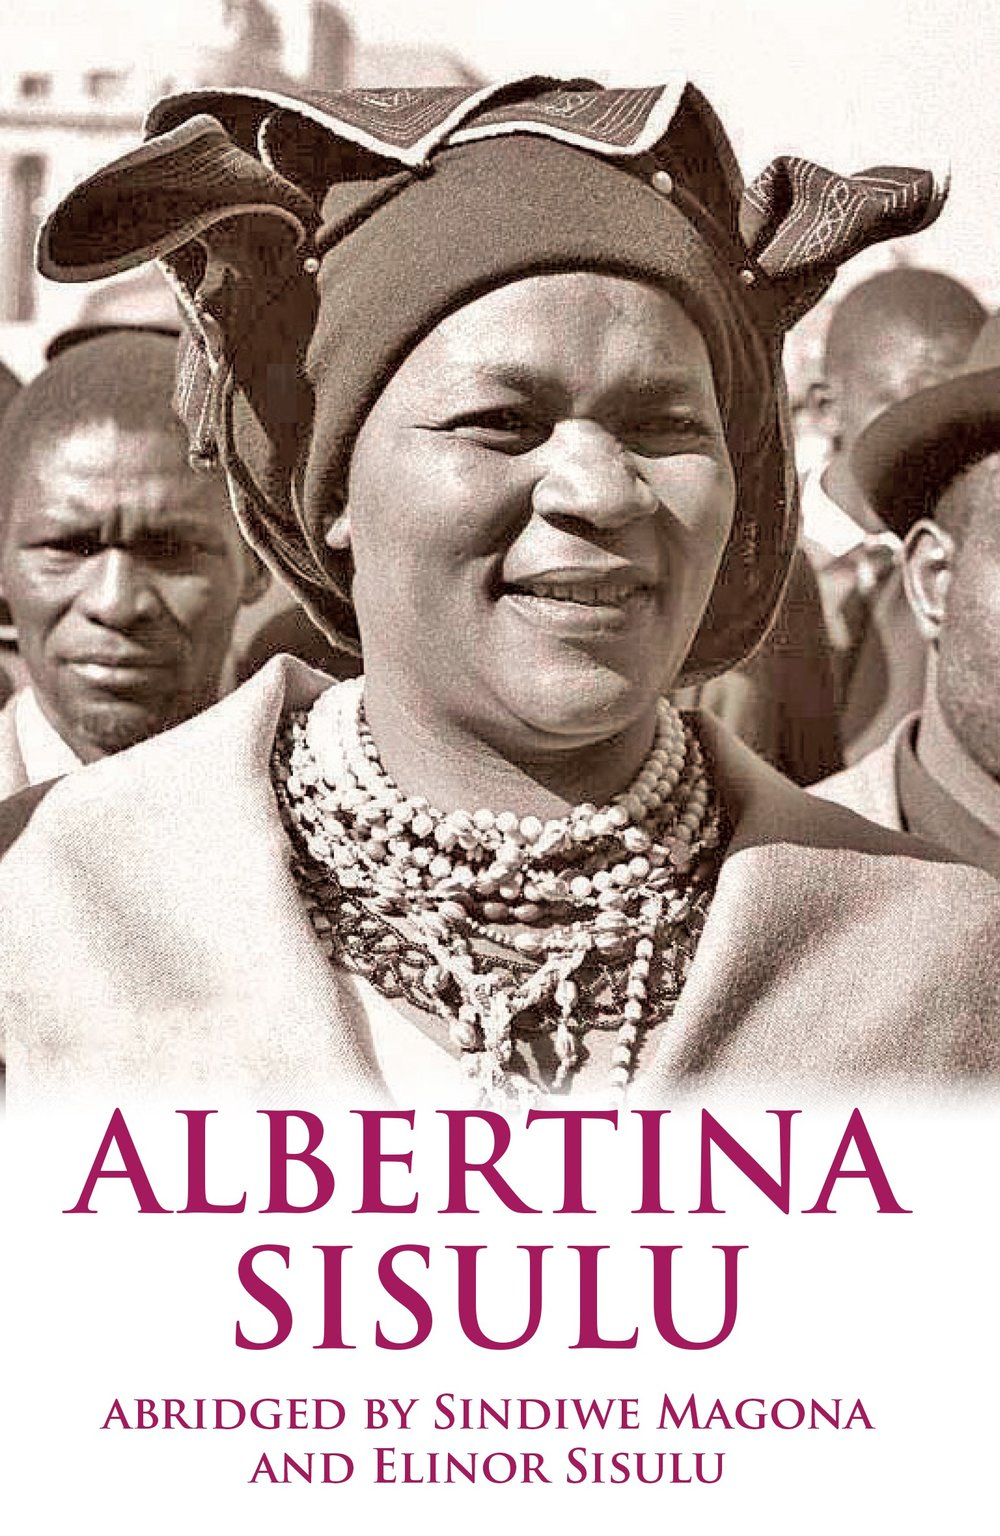 Albertina Sisulu Abridged Memoir Sindiwe Magona Elinor Sisulu New Africa Books David Philip Publishers New Release buy online